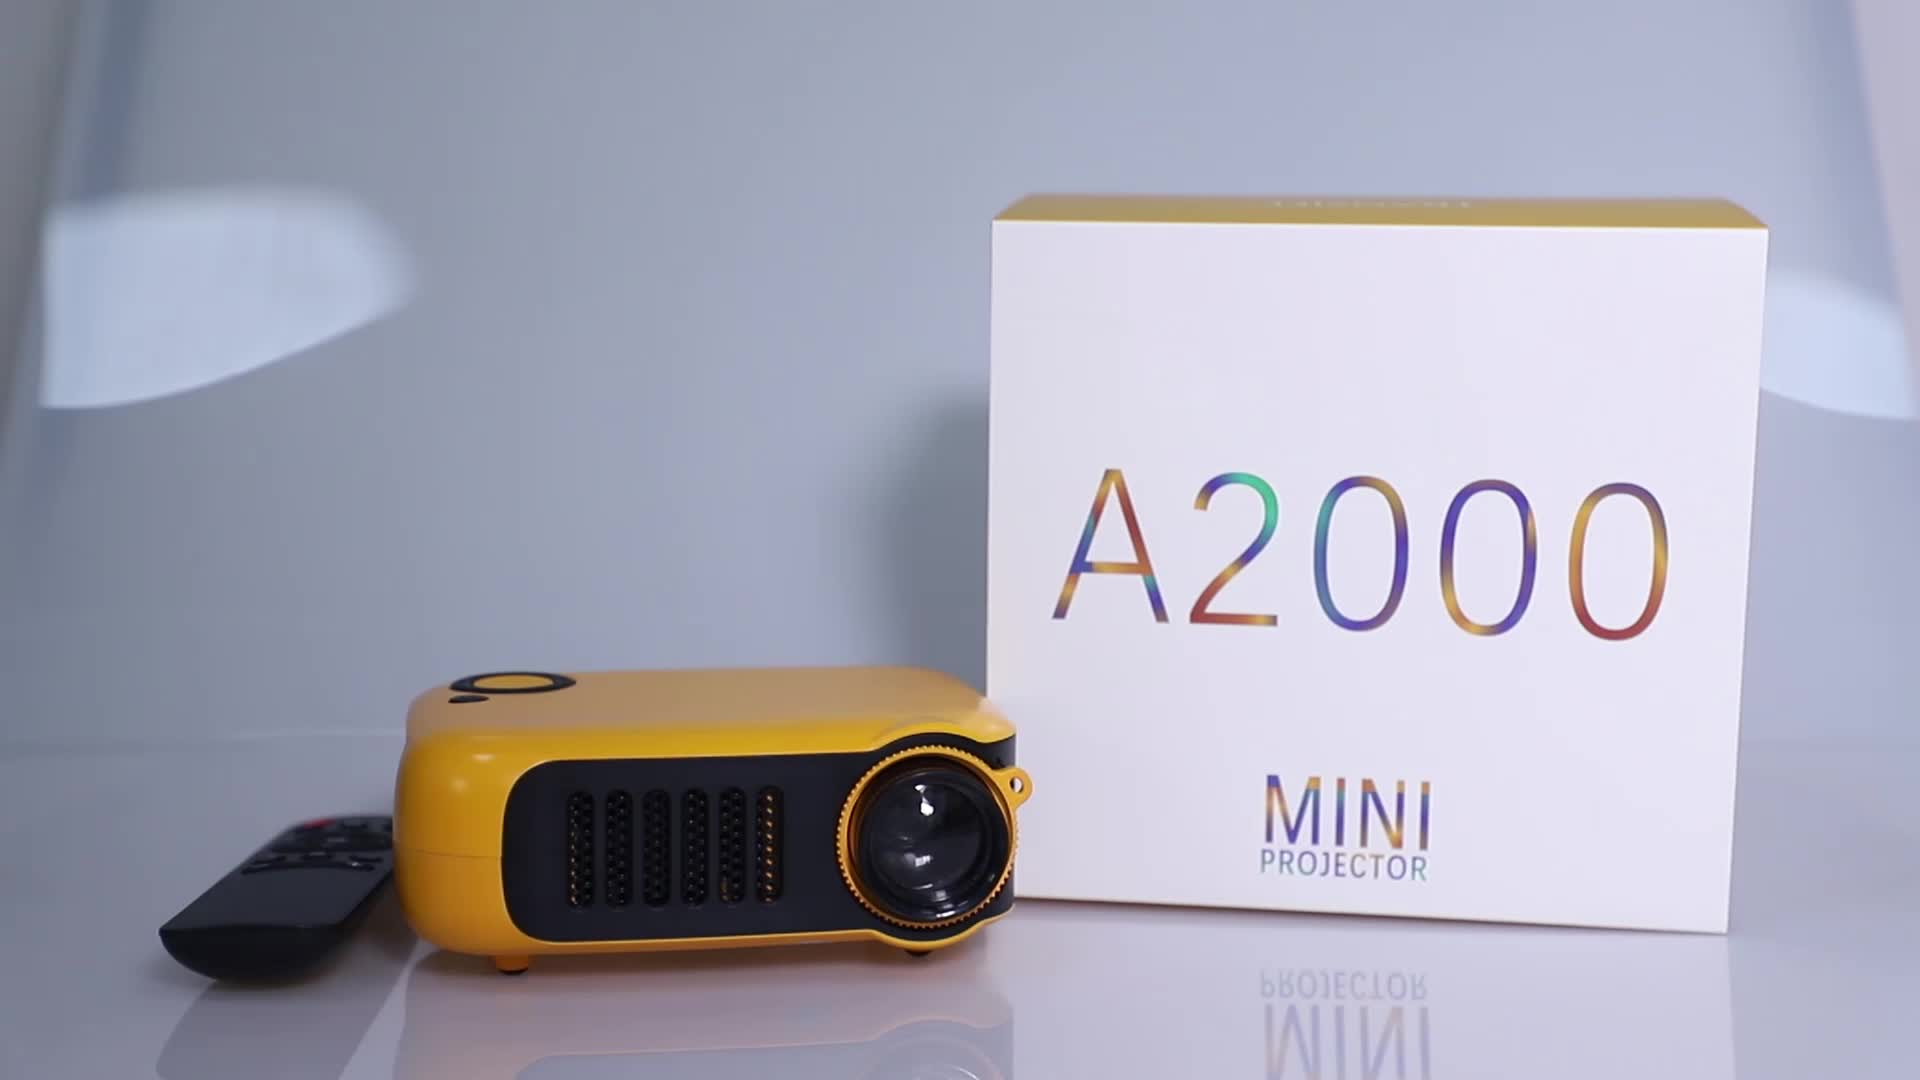 A2002 laser dlp smart mini phone vivitek silver projector screen keychain mobile 3d projection 5000 lumens hologram 1080p